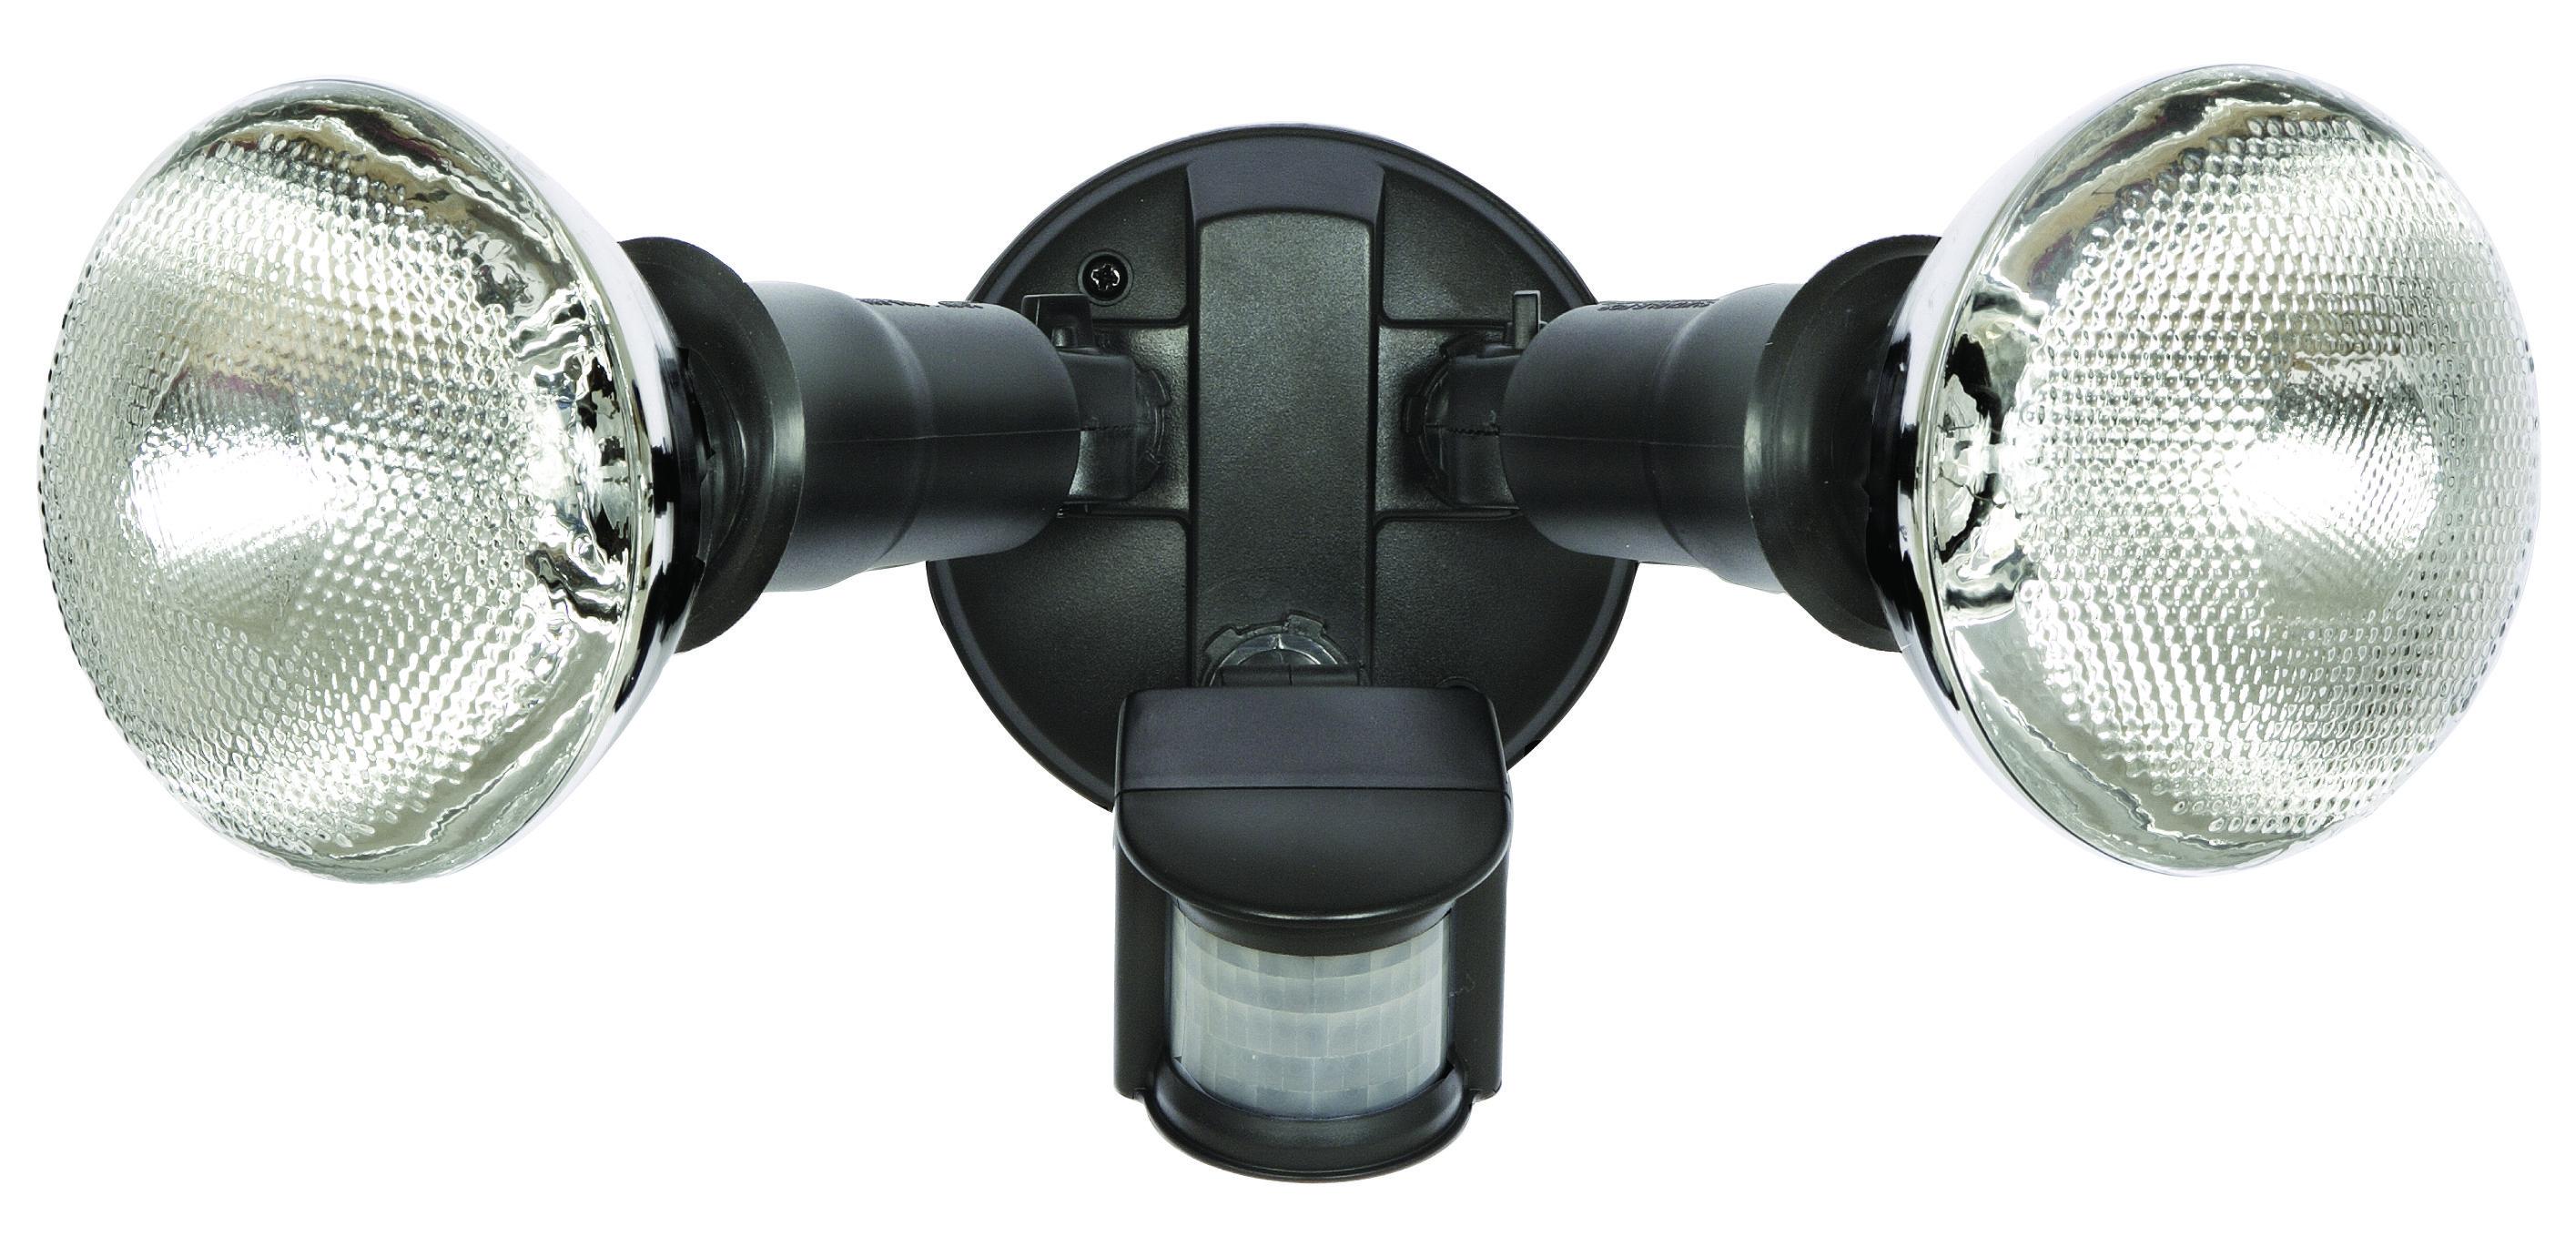 Nelson 150w Twin Security Sensor Light Bunnings